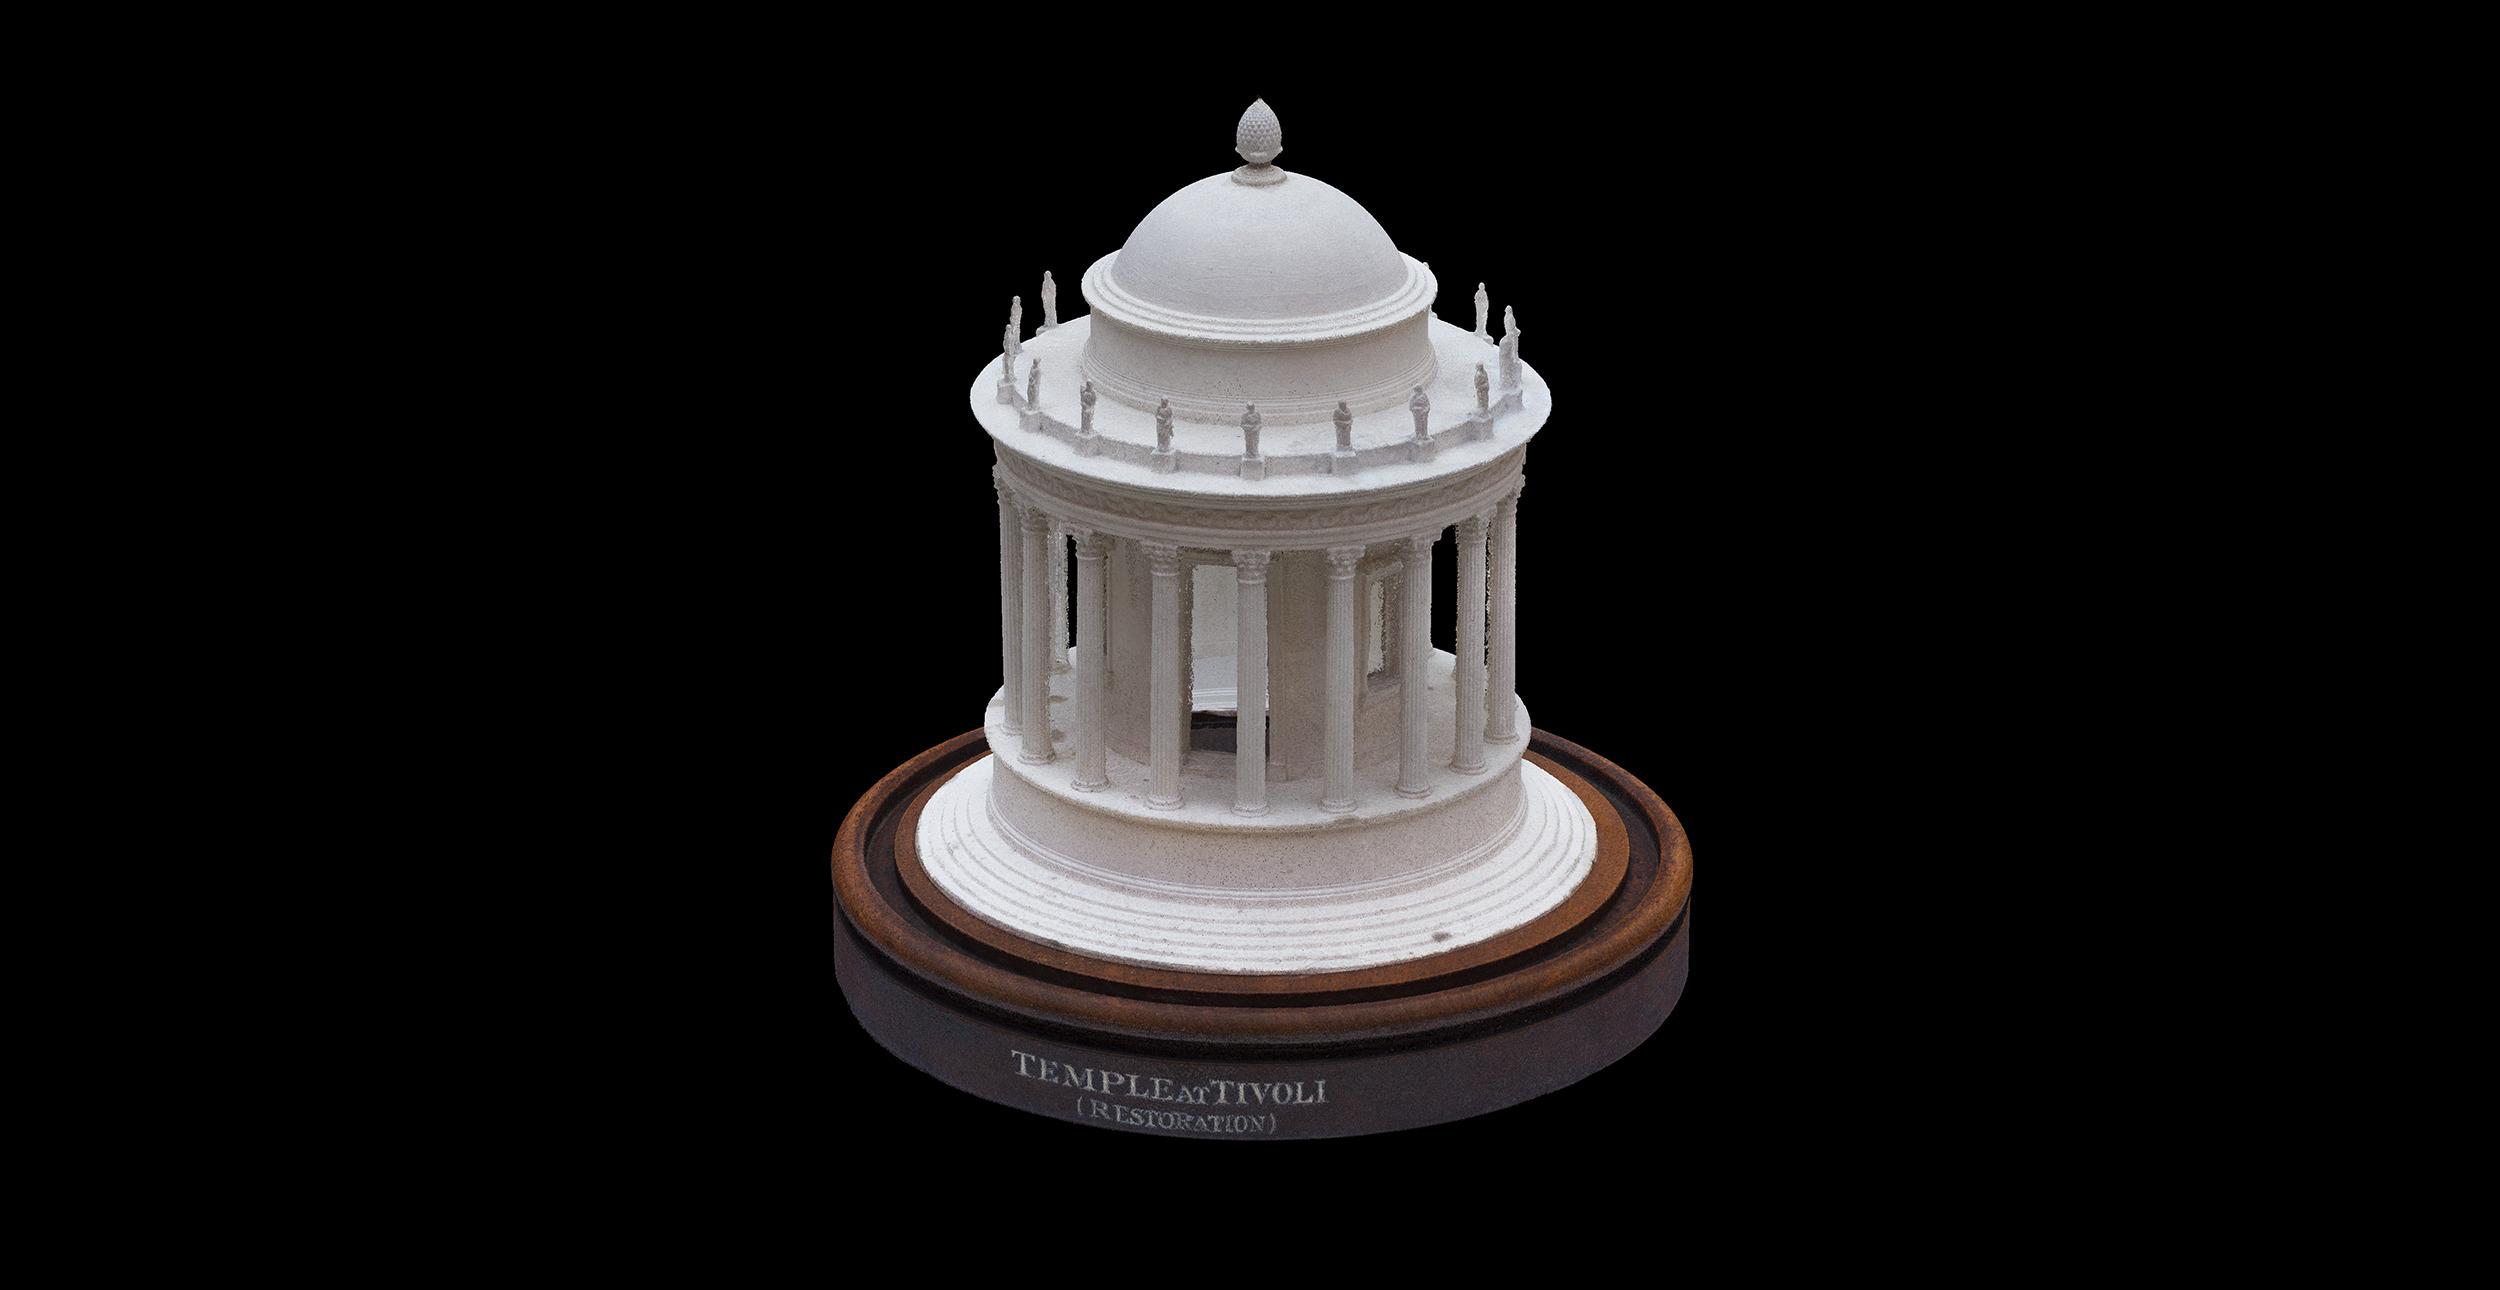 plaster_model_of_the_temple_of_vesta_tivoli